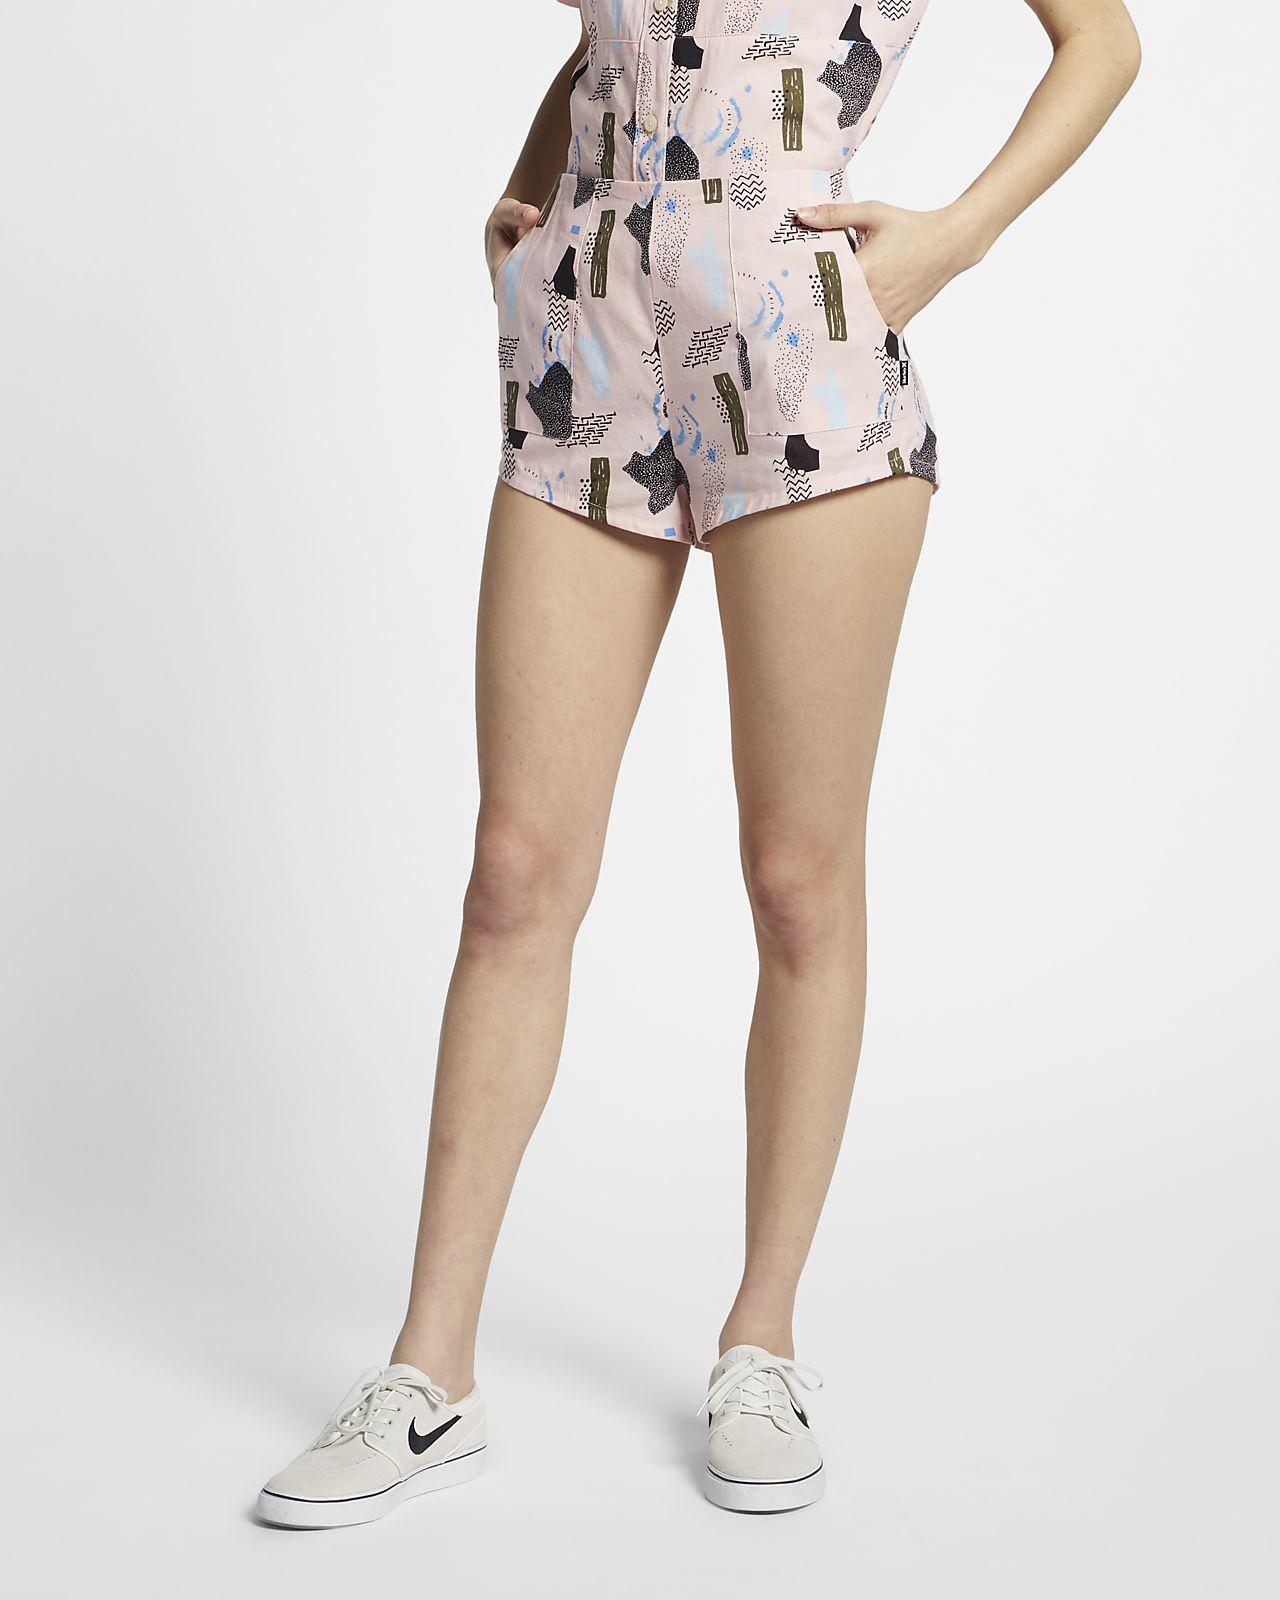 Hurley Free Set Women's Shorts